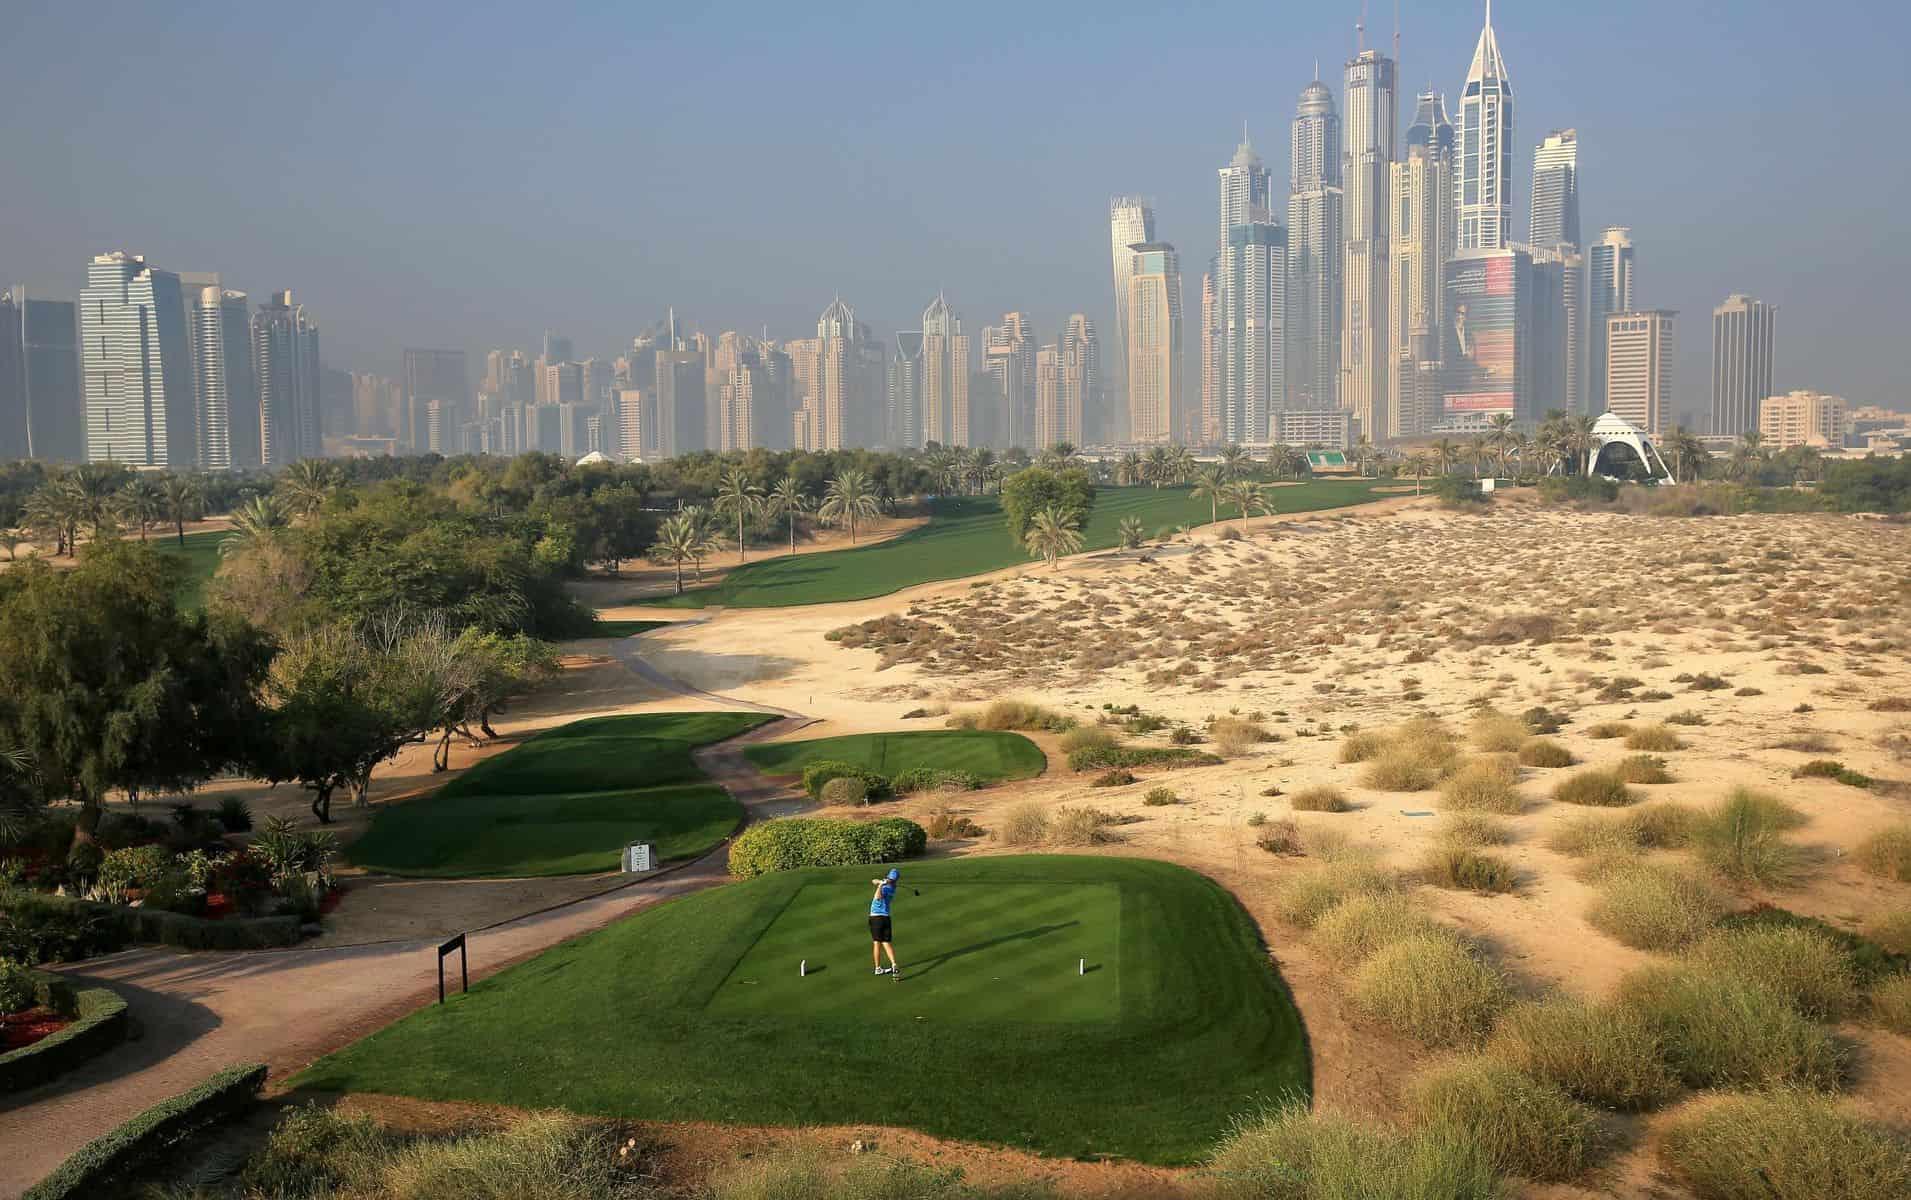 Emirates golf club, Majlis, Dubai